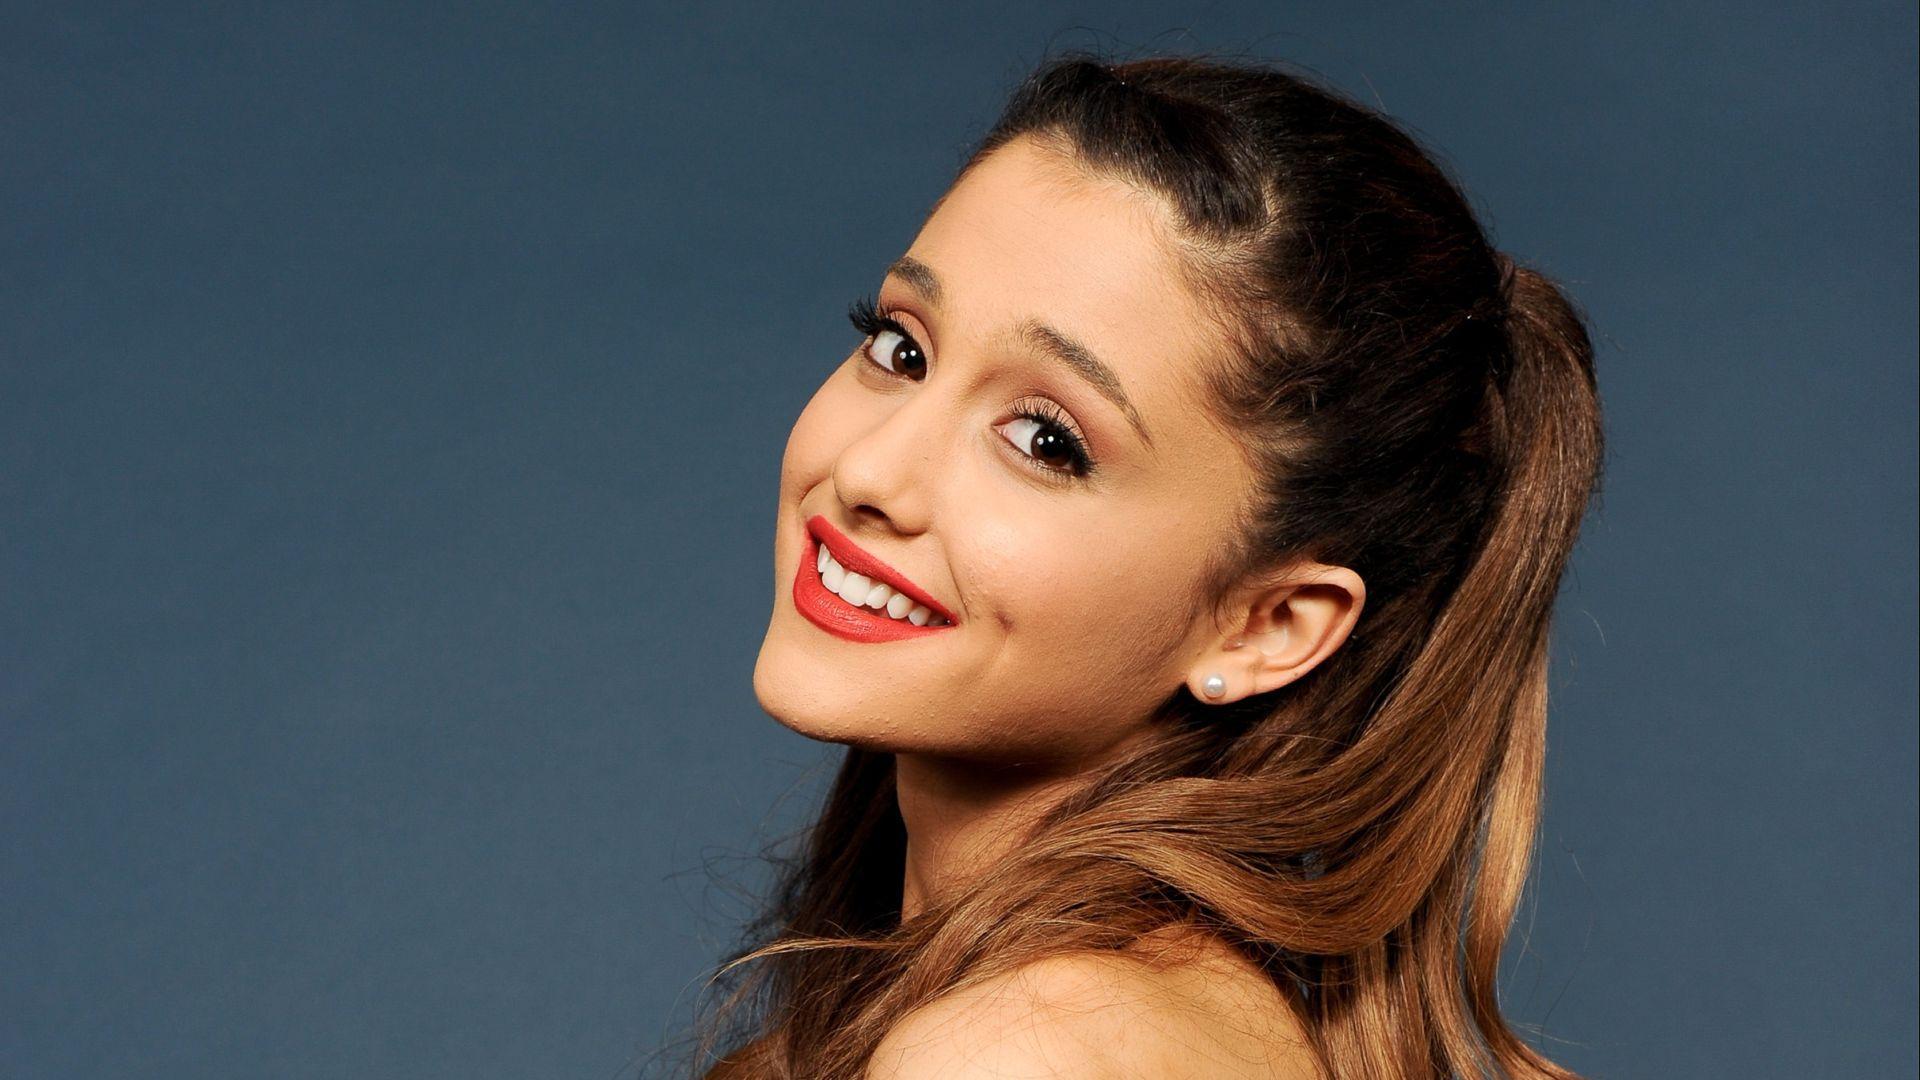 Ariana Grande Backdrop Wallpaper